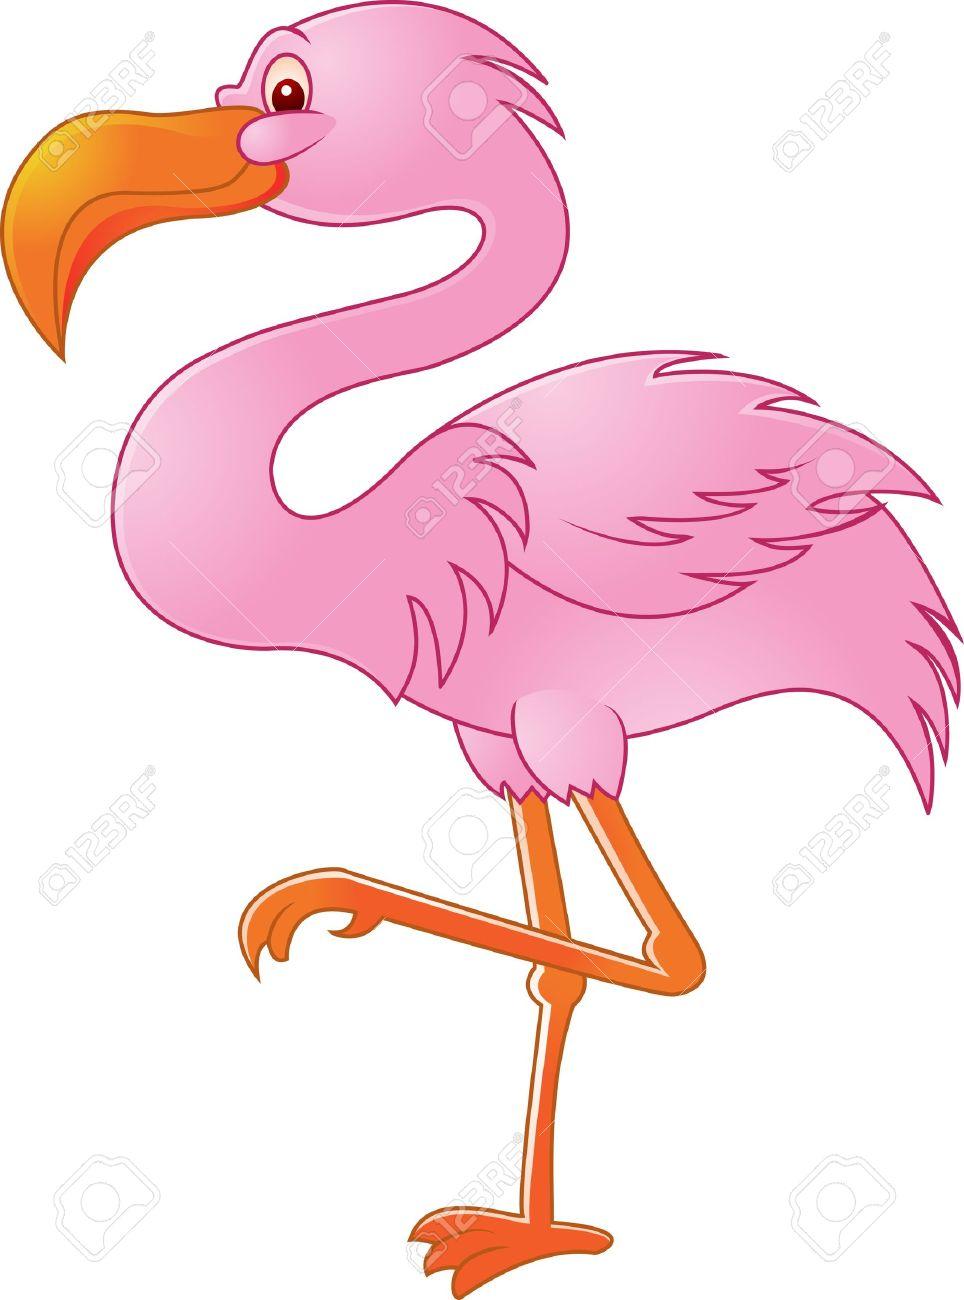 Flamingo Cartoon Drawing at GetDrawings.com | Free for personal use ...